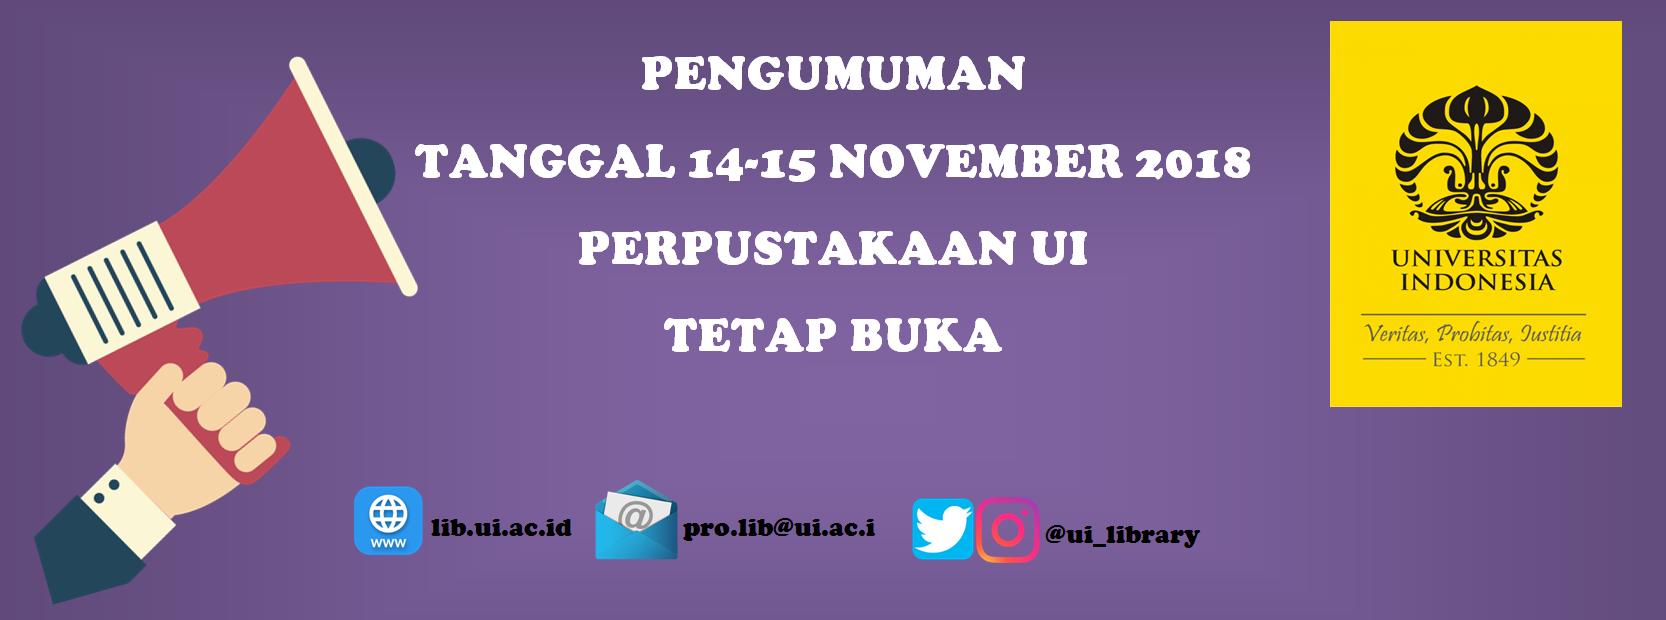 OPAC - Universitas Indonesia Library